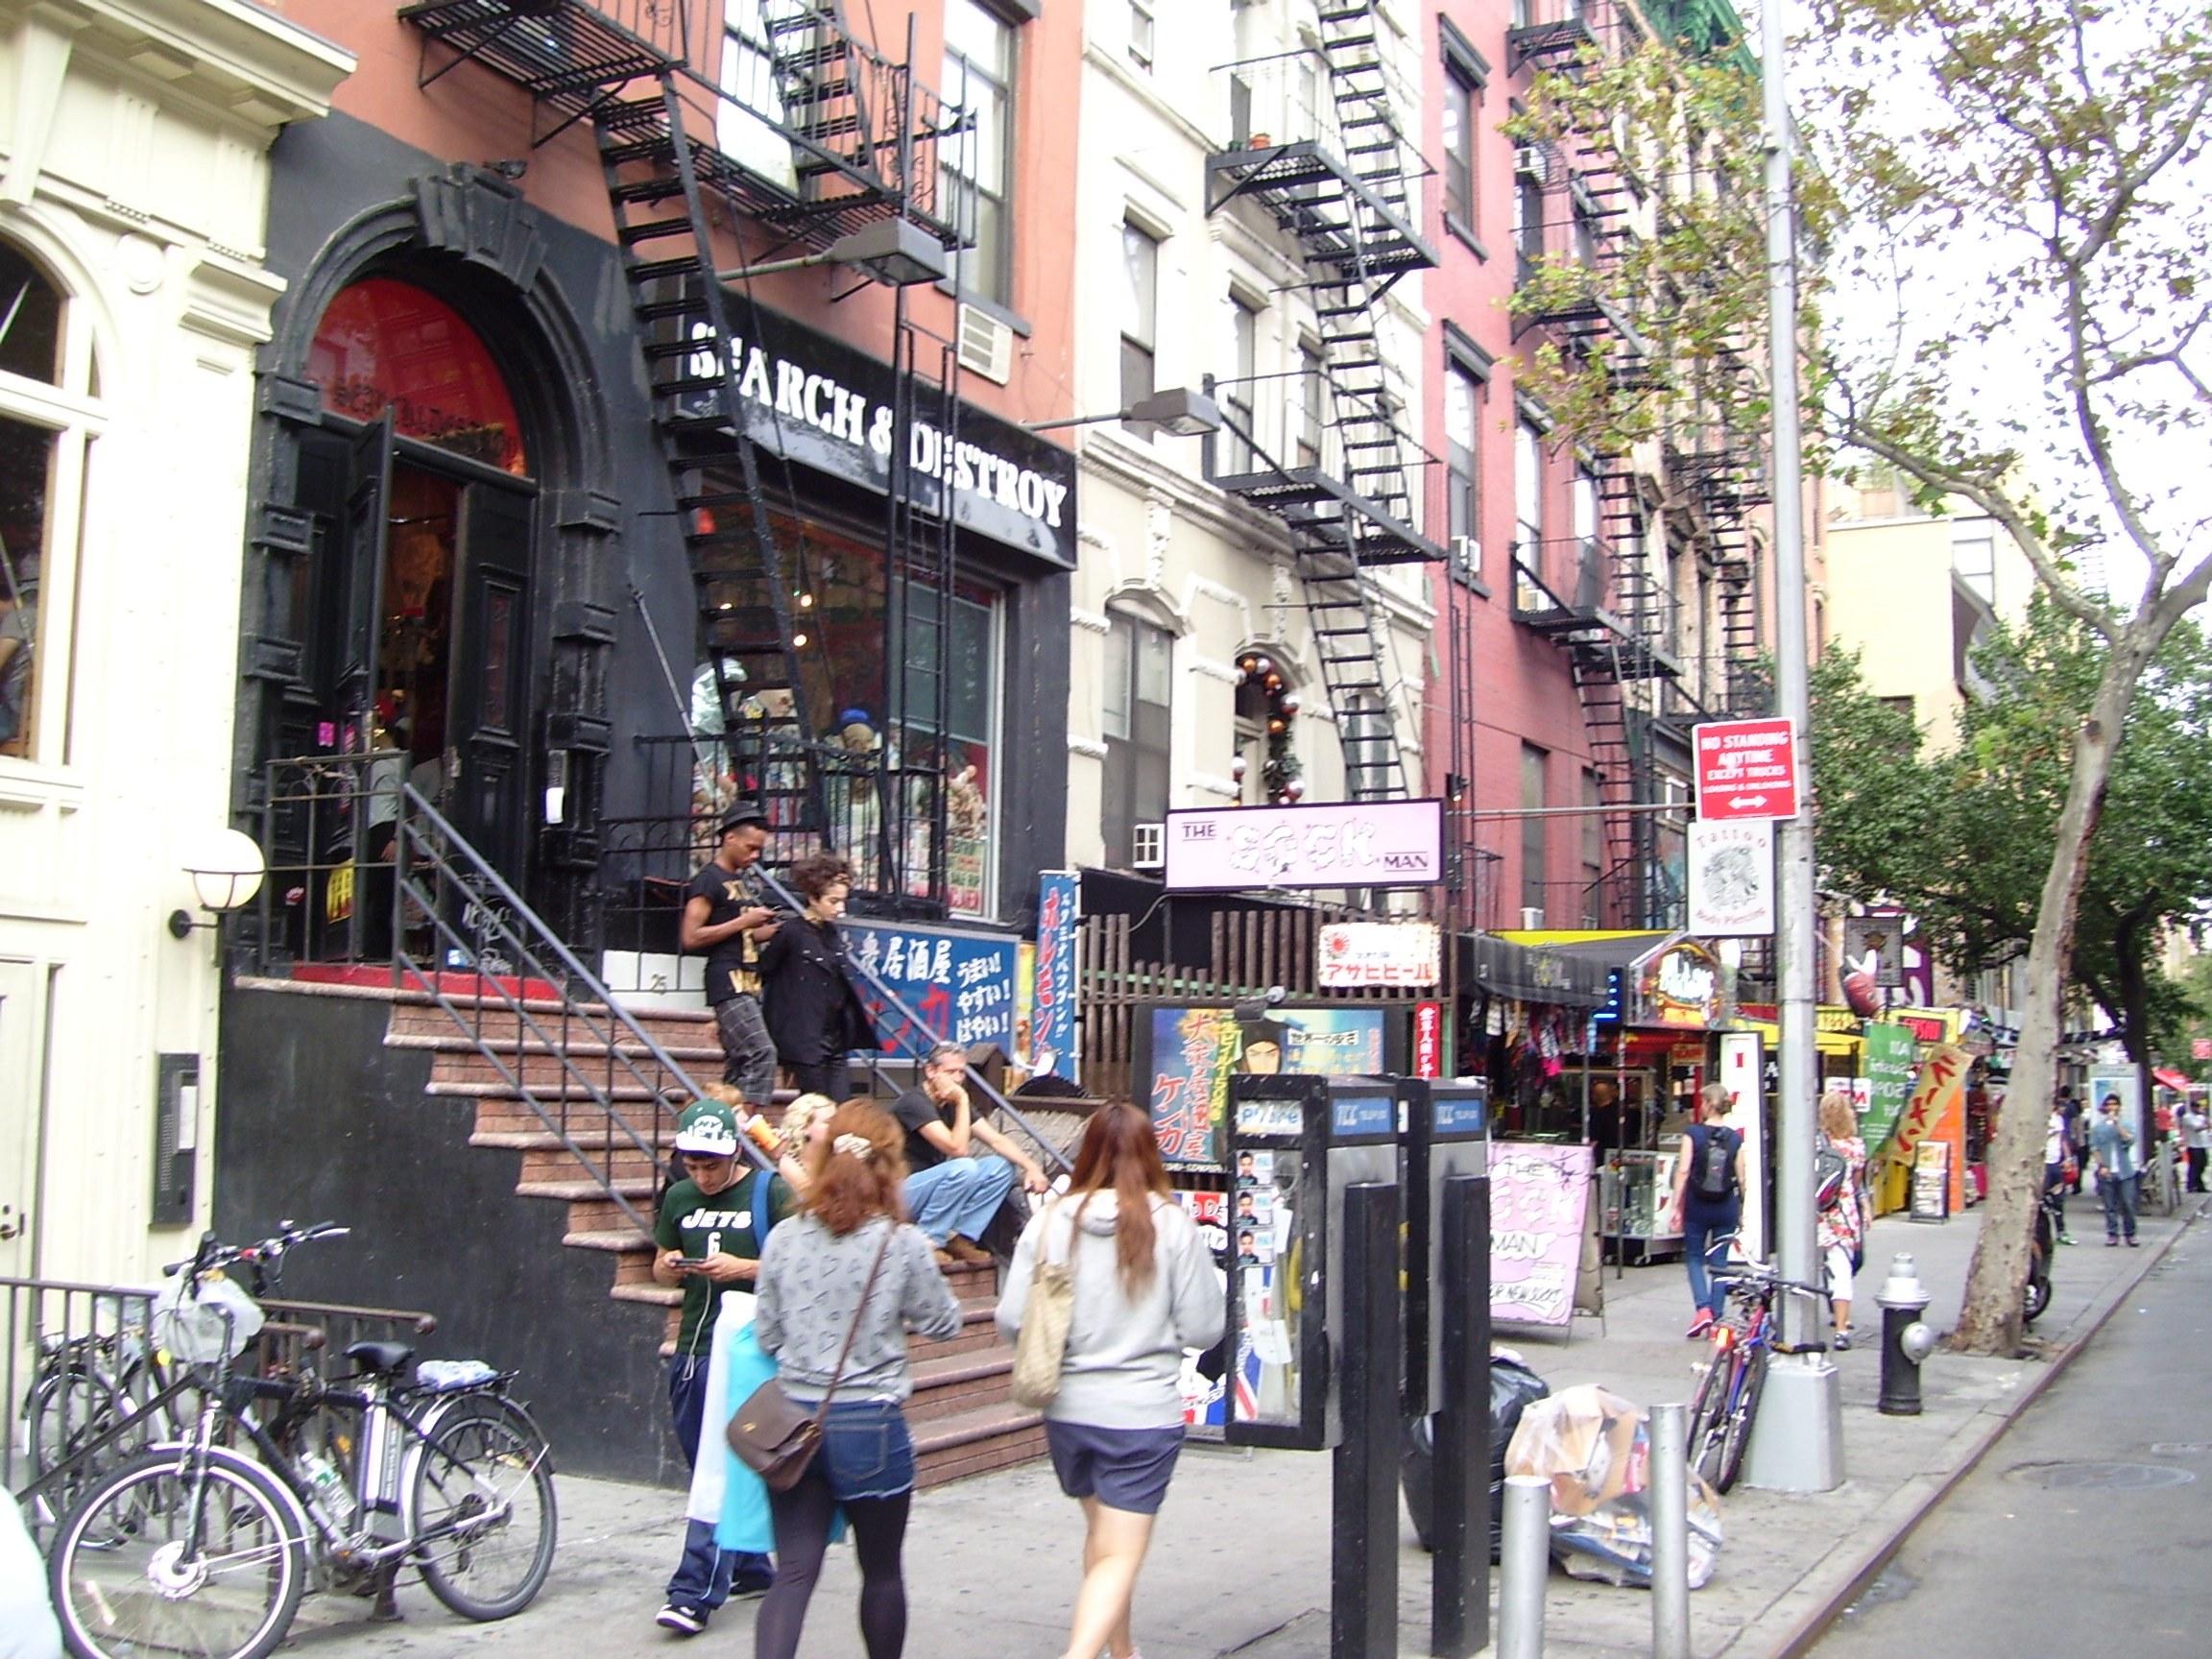 Turkish Restaurants Nyc Upper East Side